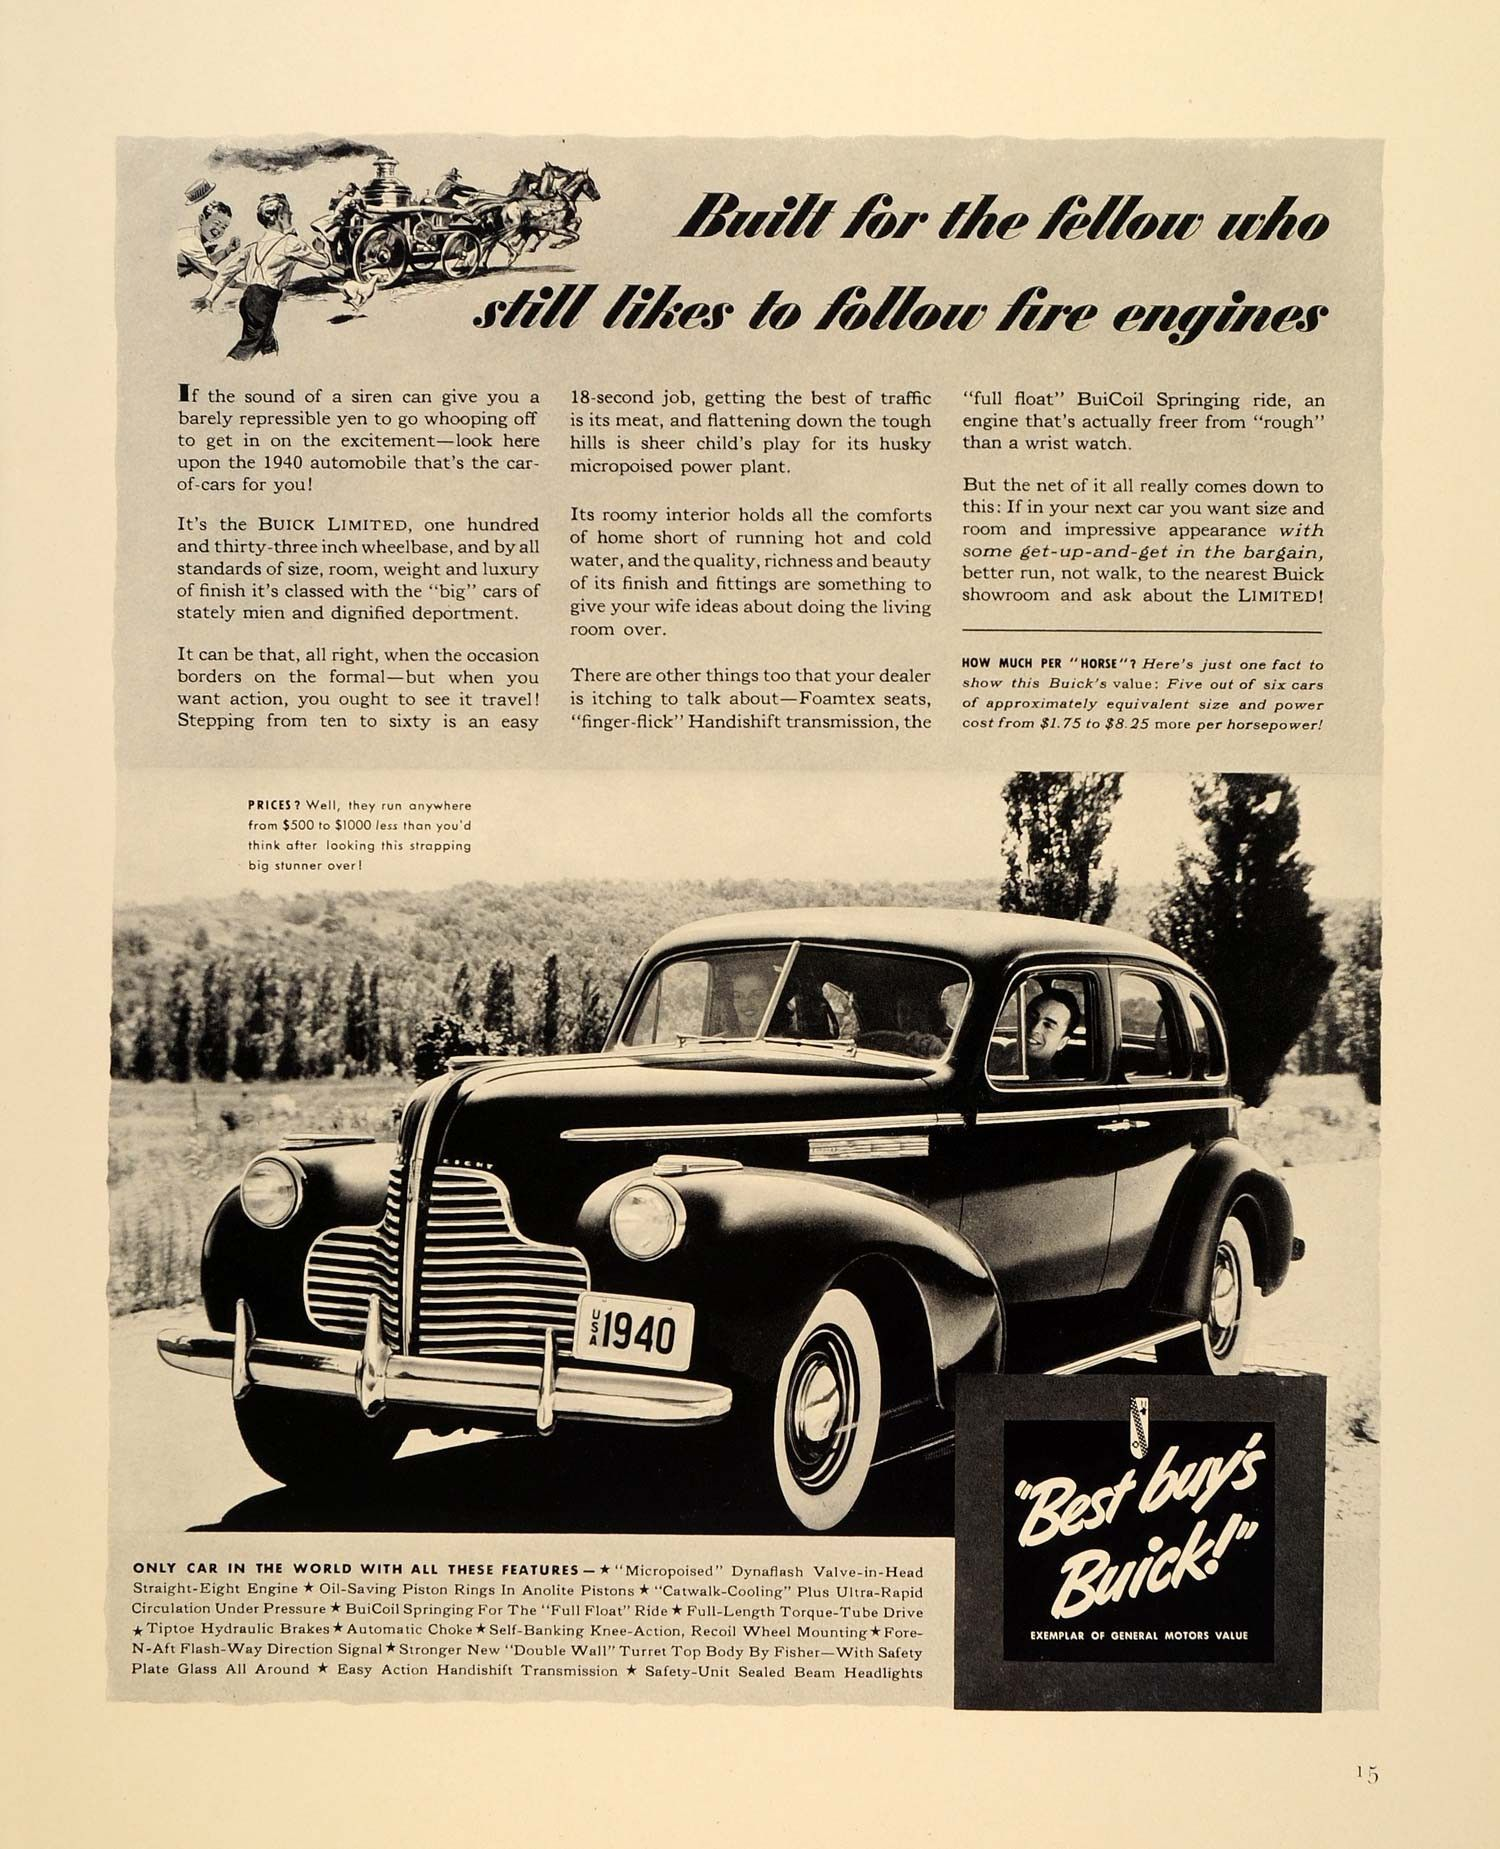 1939 Ad General Motors 1940 Buick Limited Automobile Original